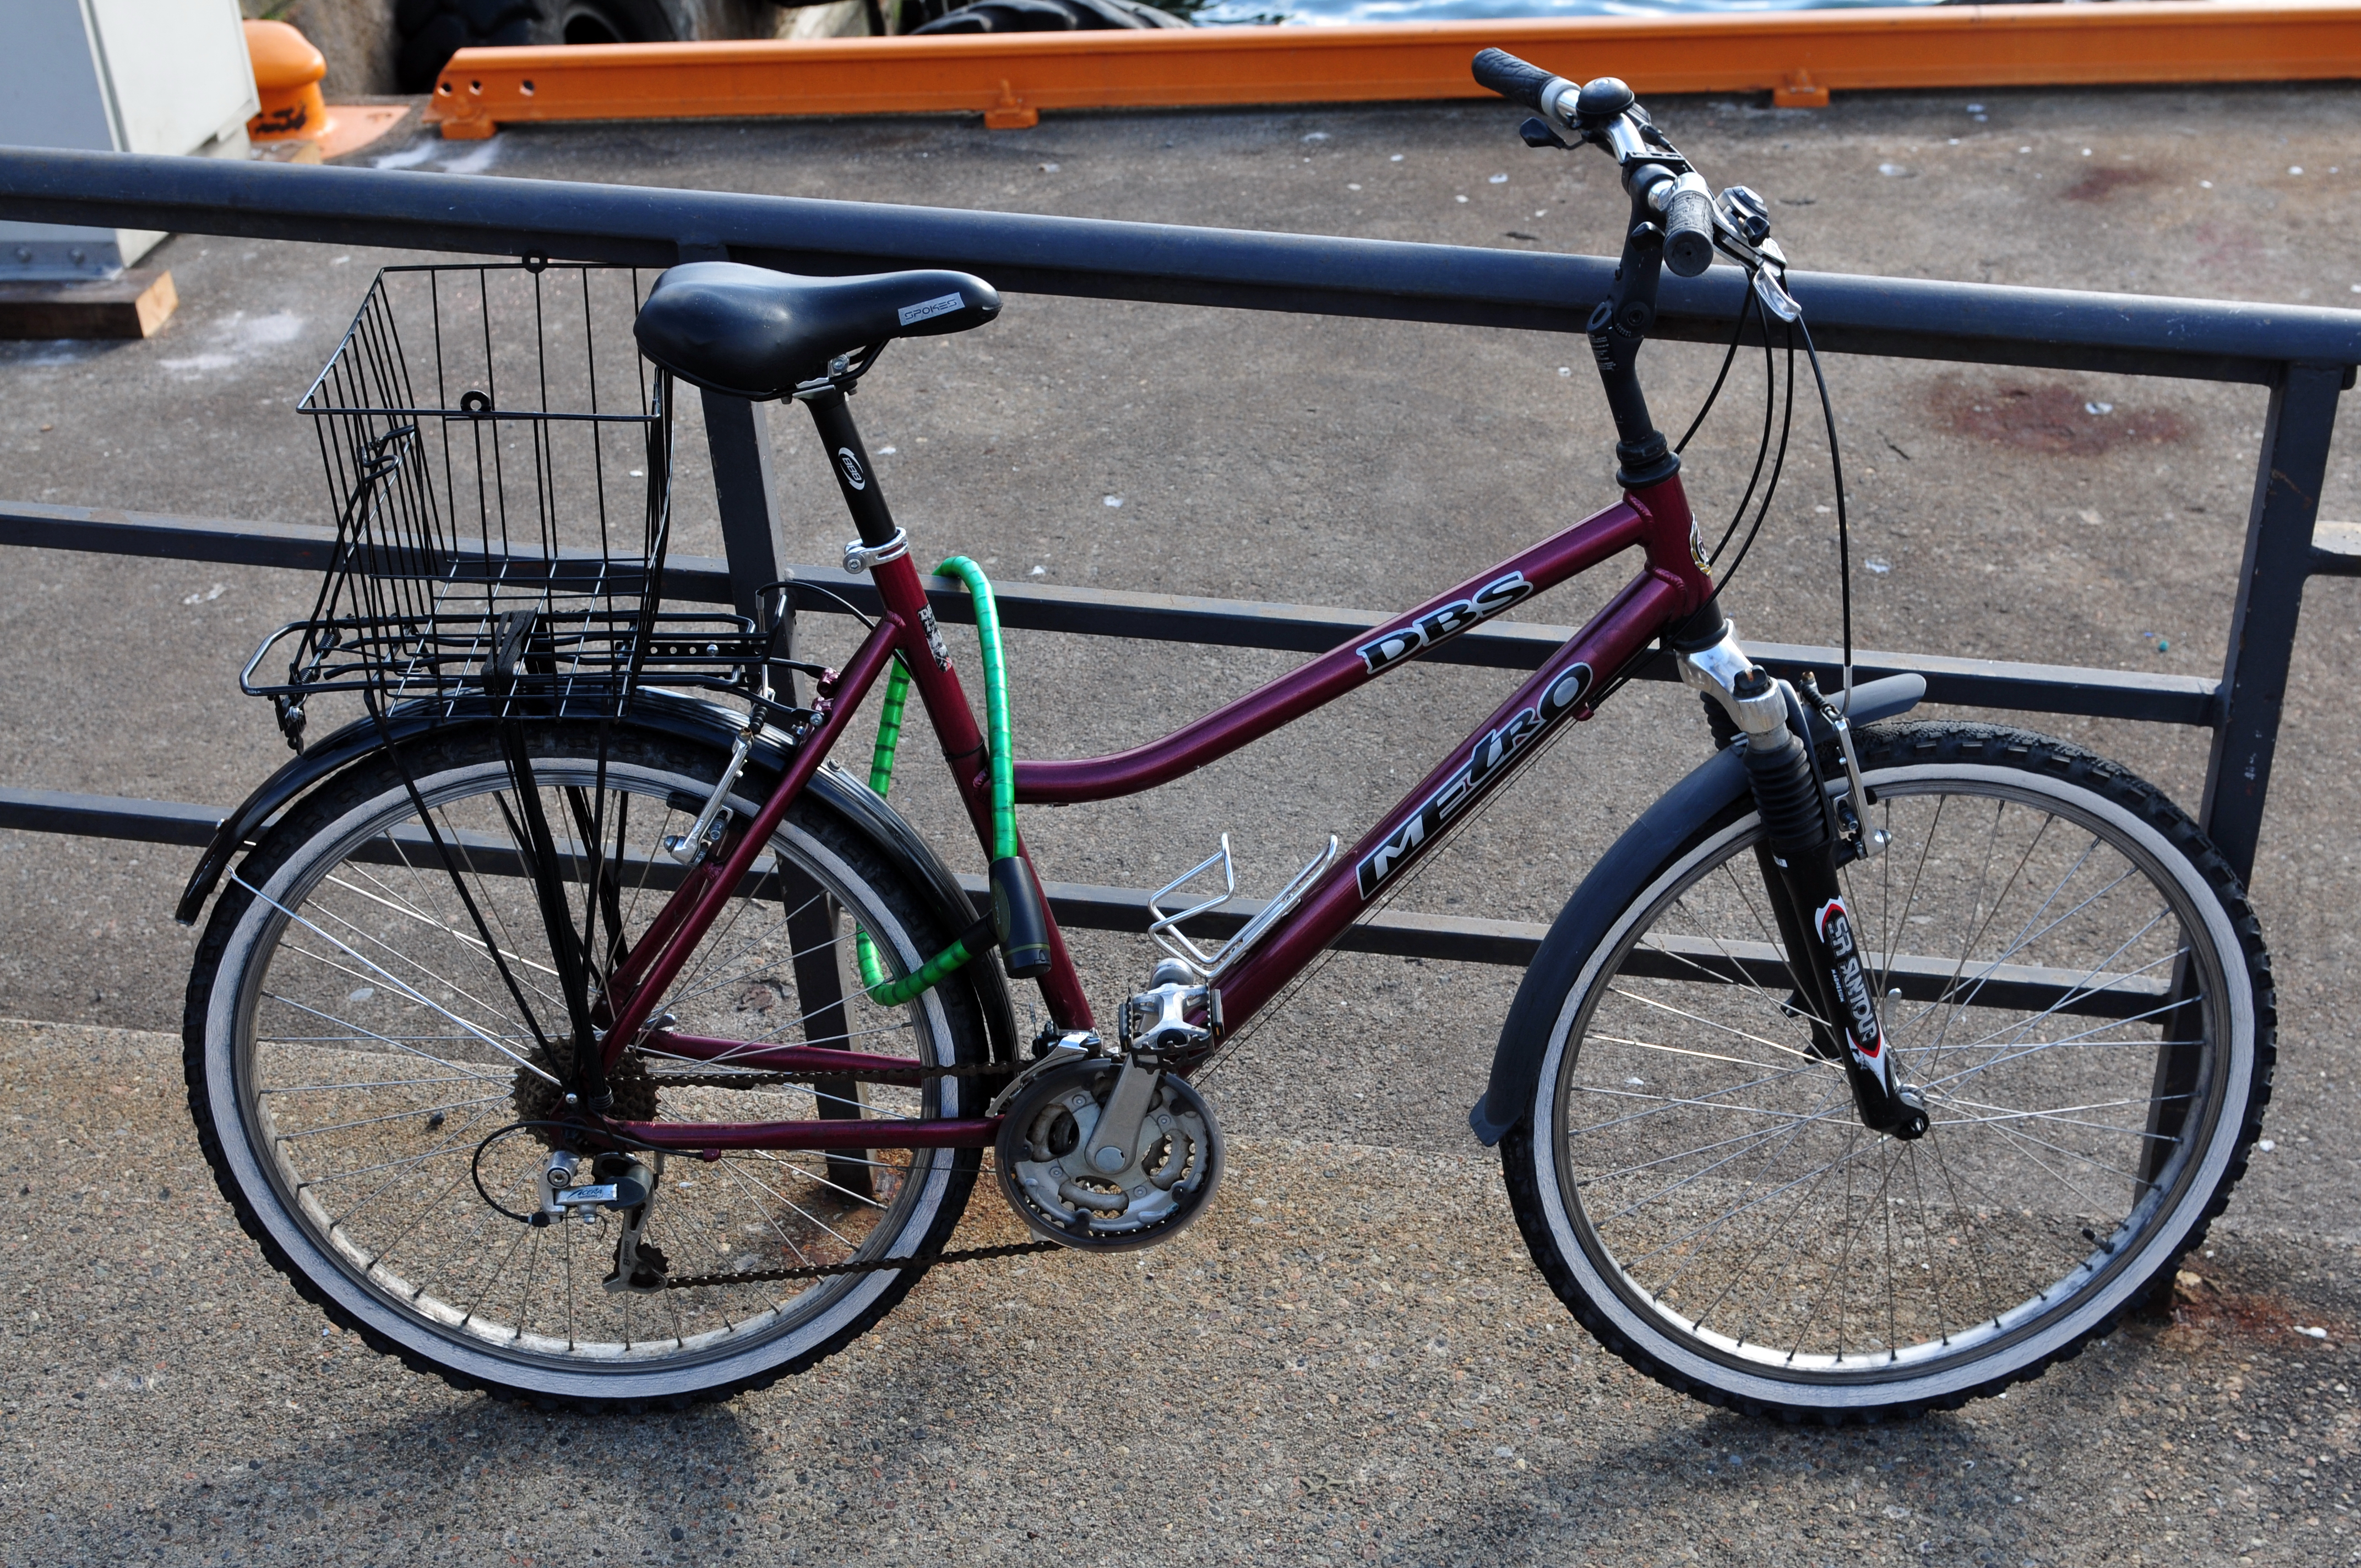 14-09-02-fahrrad-oslo-37.jpg